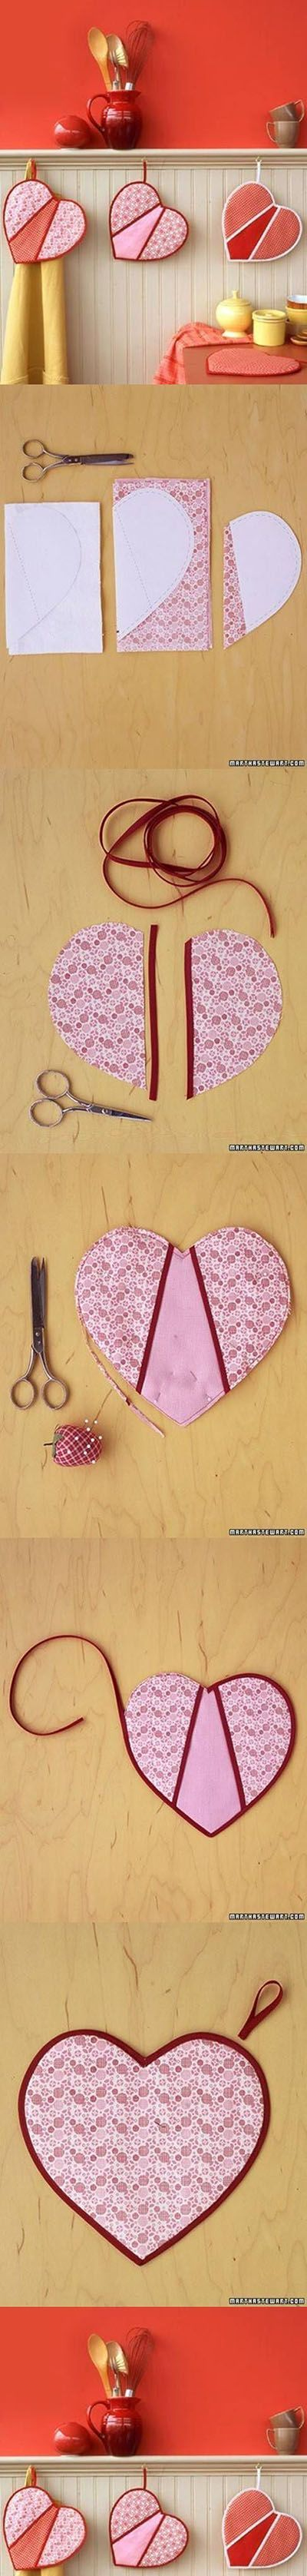 DIY Heart Shaped Pot Holders | DIY & Crafts Tutorials